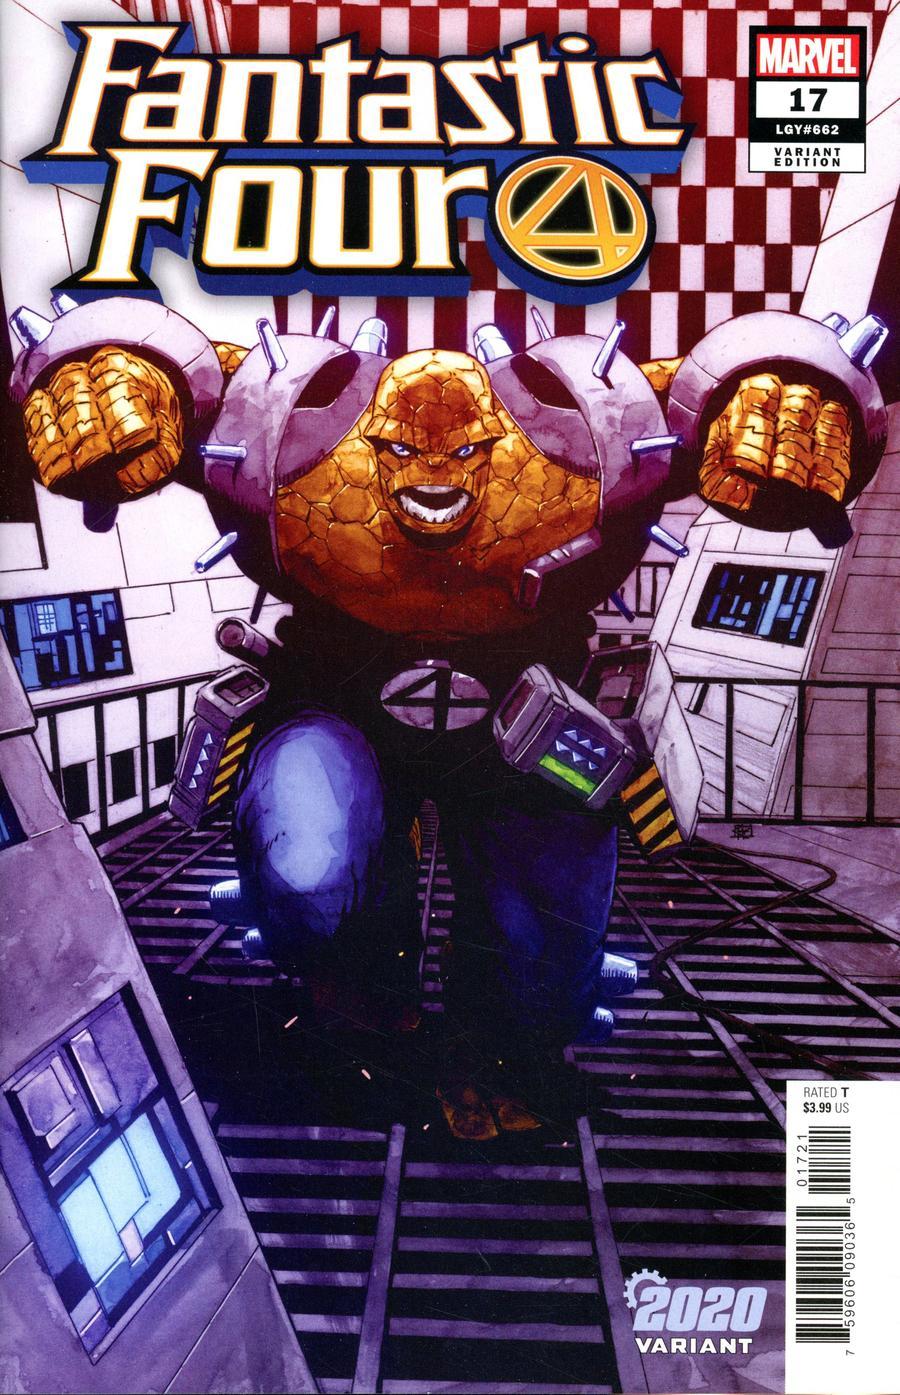 Fantastic Four Vol 6 #17 Cover B Variant Khoi Pham 2020 Cover